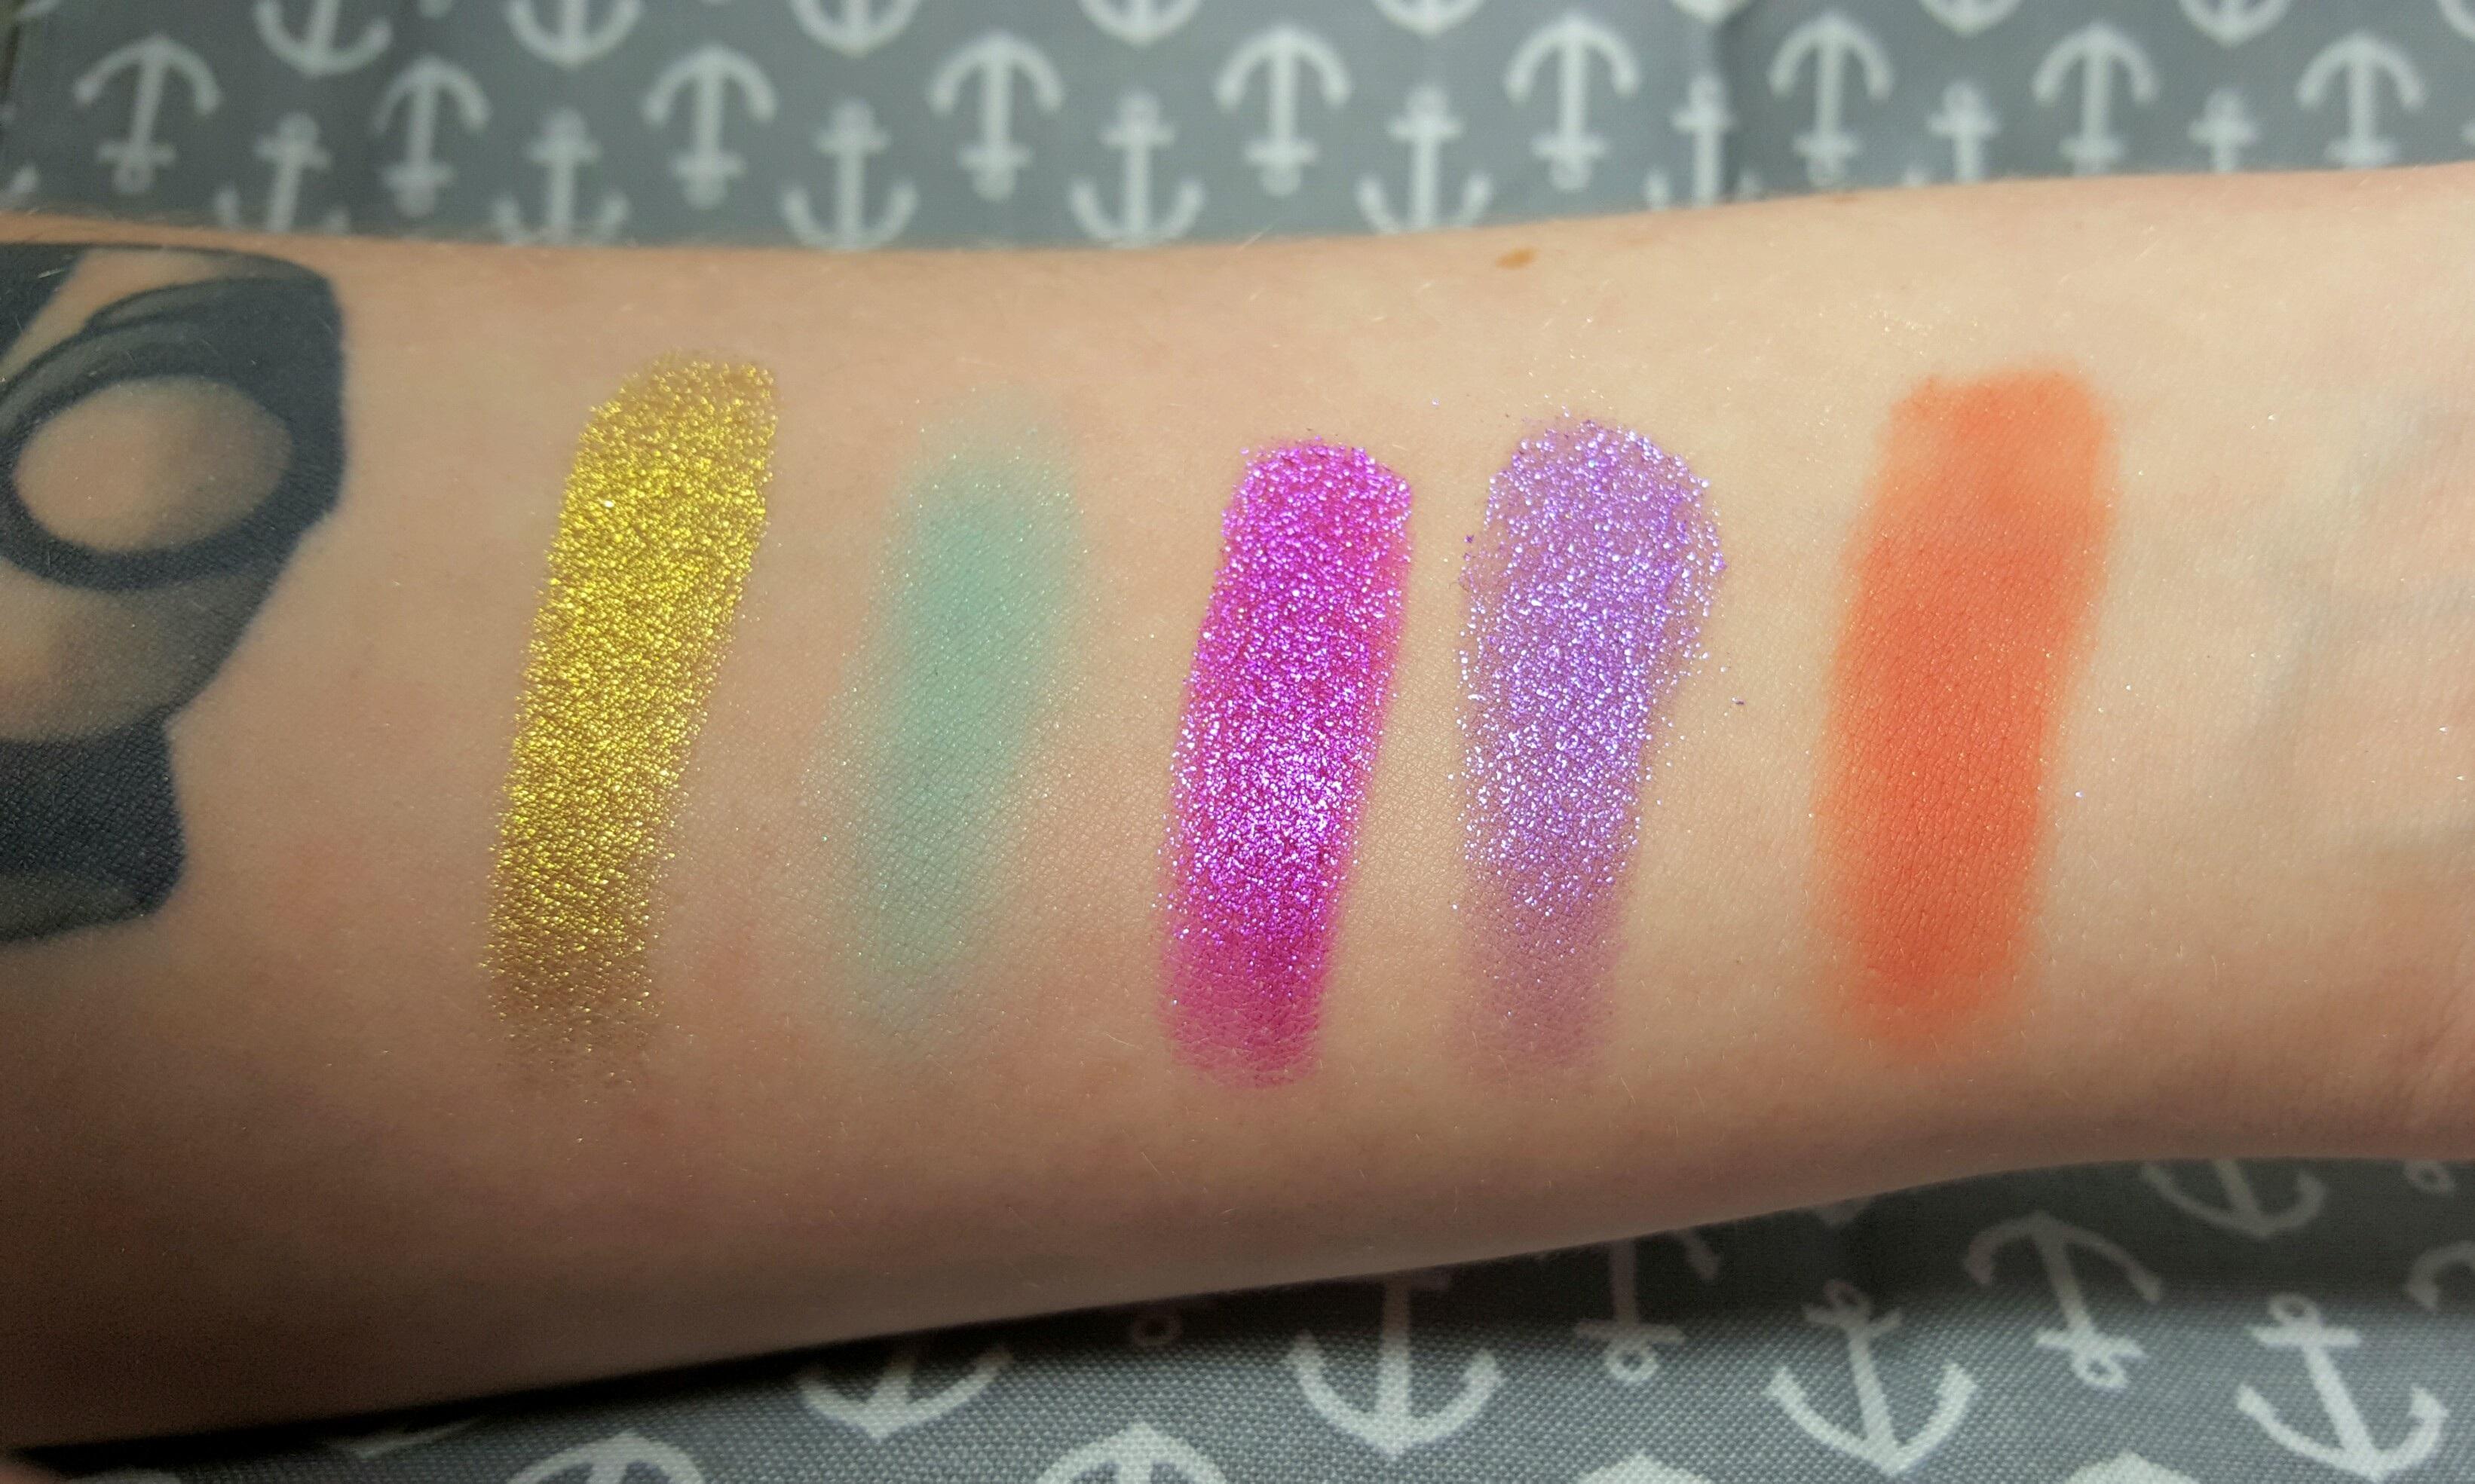 Hand Finger Color Colorful Pink Nail Lip Makeup Make Up Eyelash Eyes Eye Lipstick Cosmetics Glamour